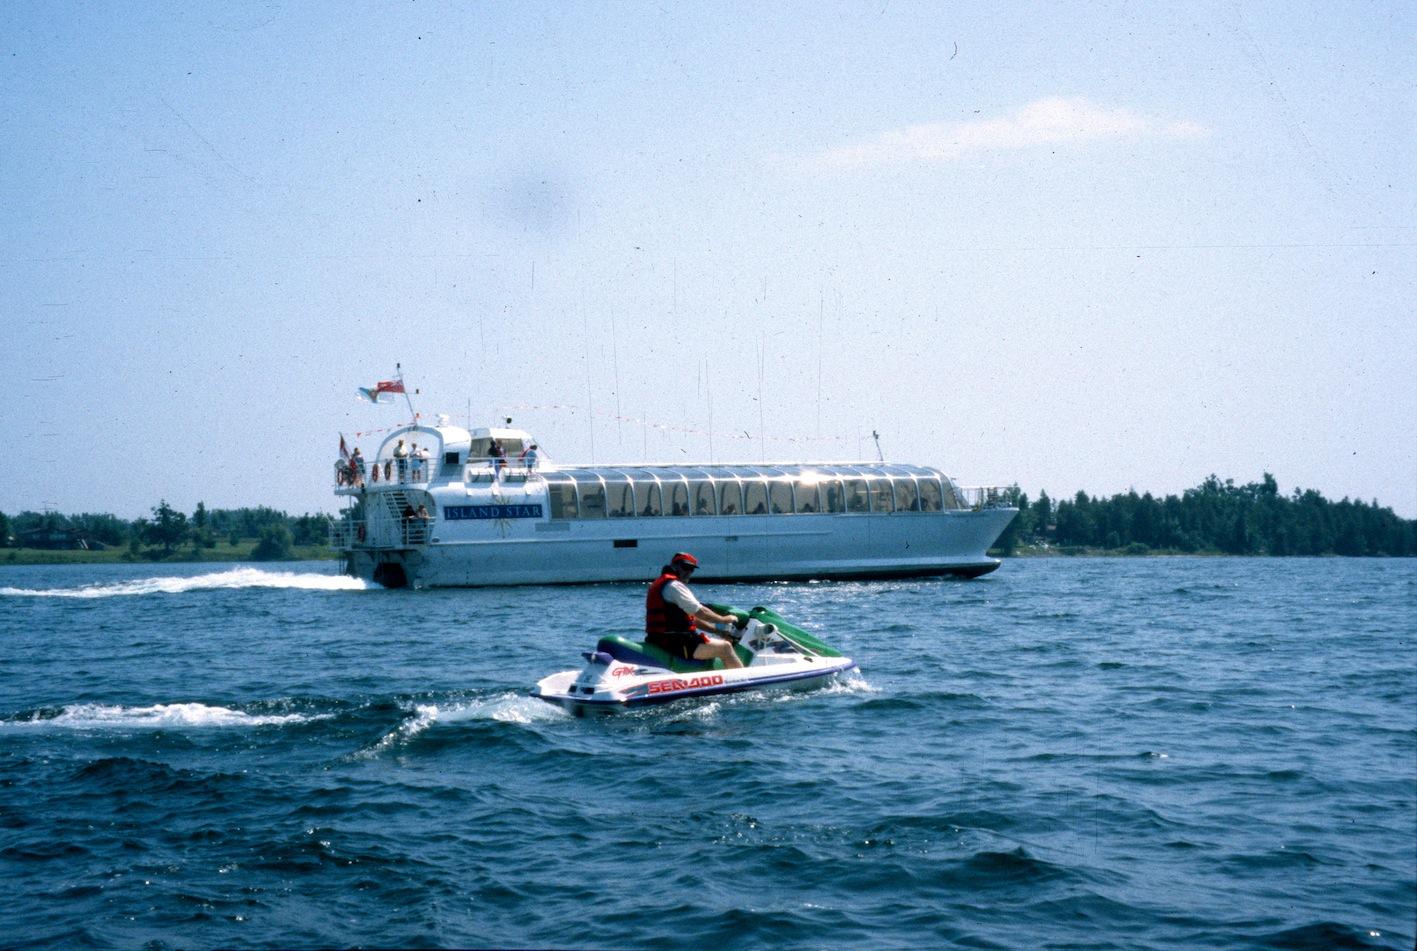 Cruise boat near Rockport on the Rideau Canal Sea Doo Tour